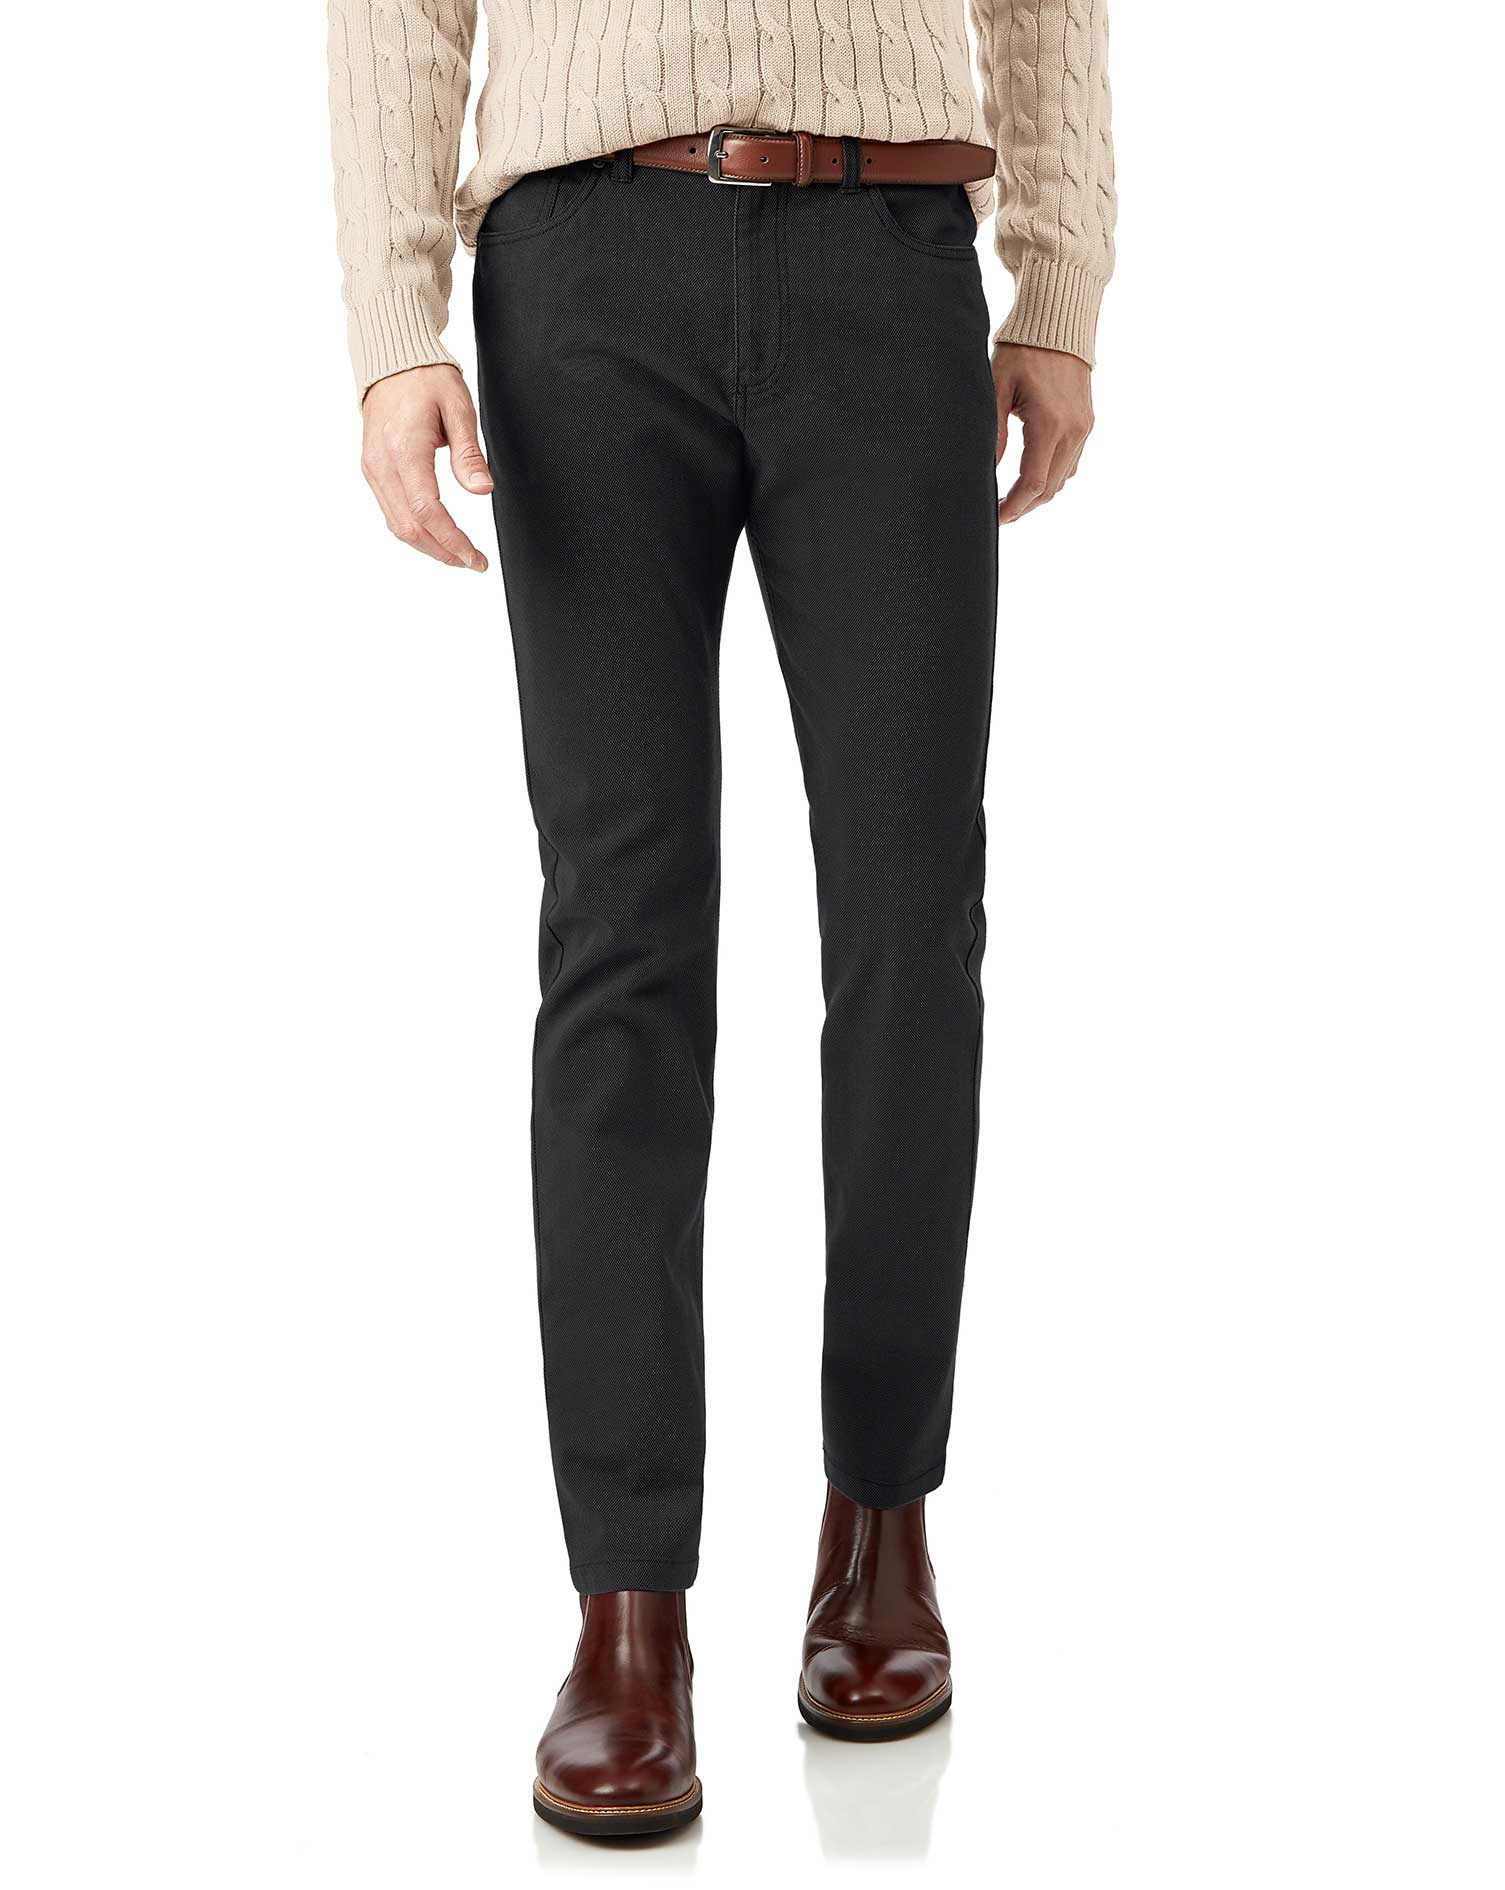 Cotton Charcoal Diamond Texture Stretch 5-Pocket Trousers